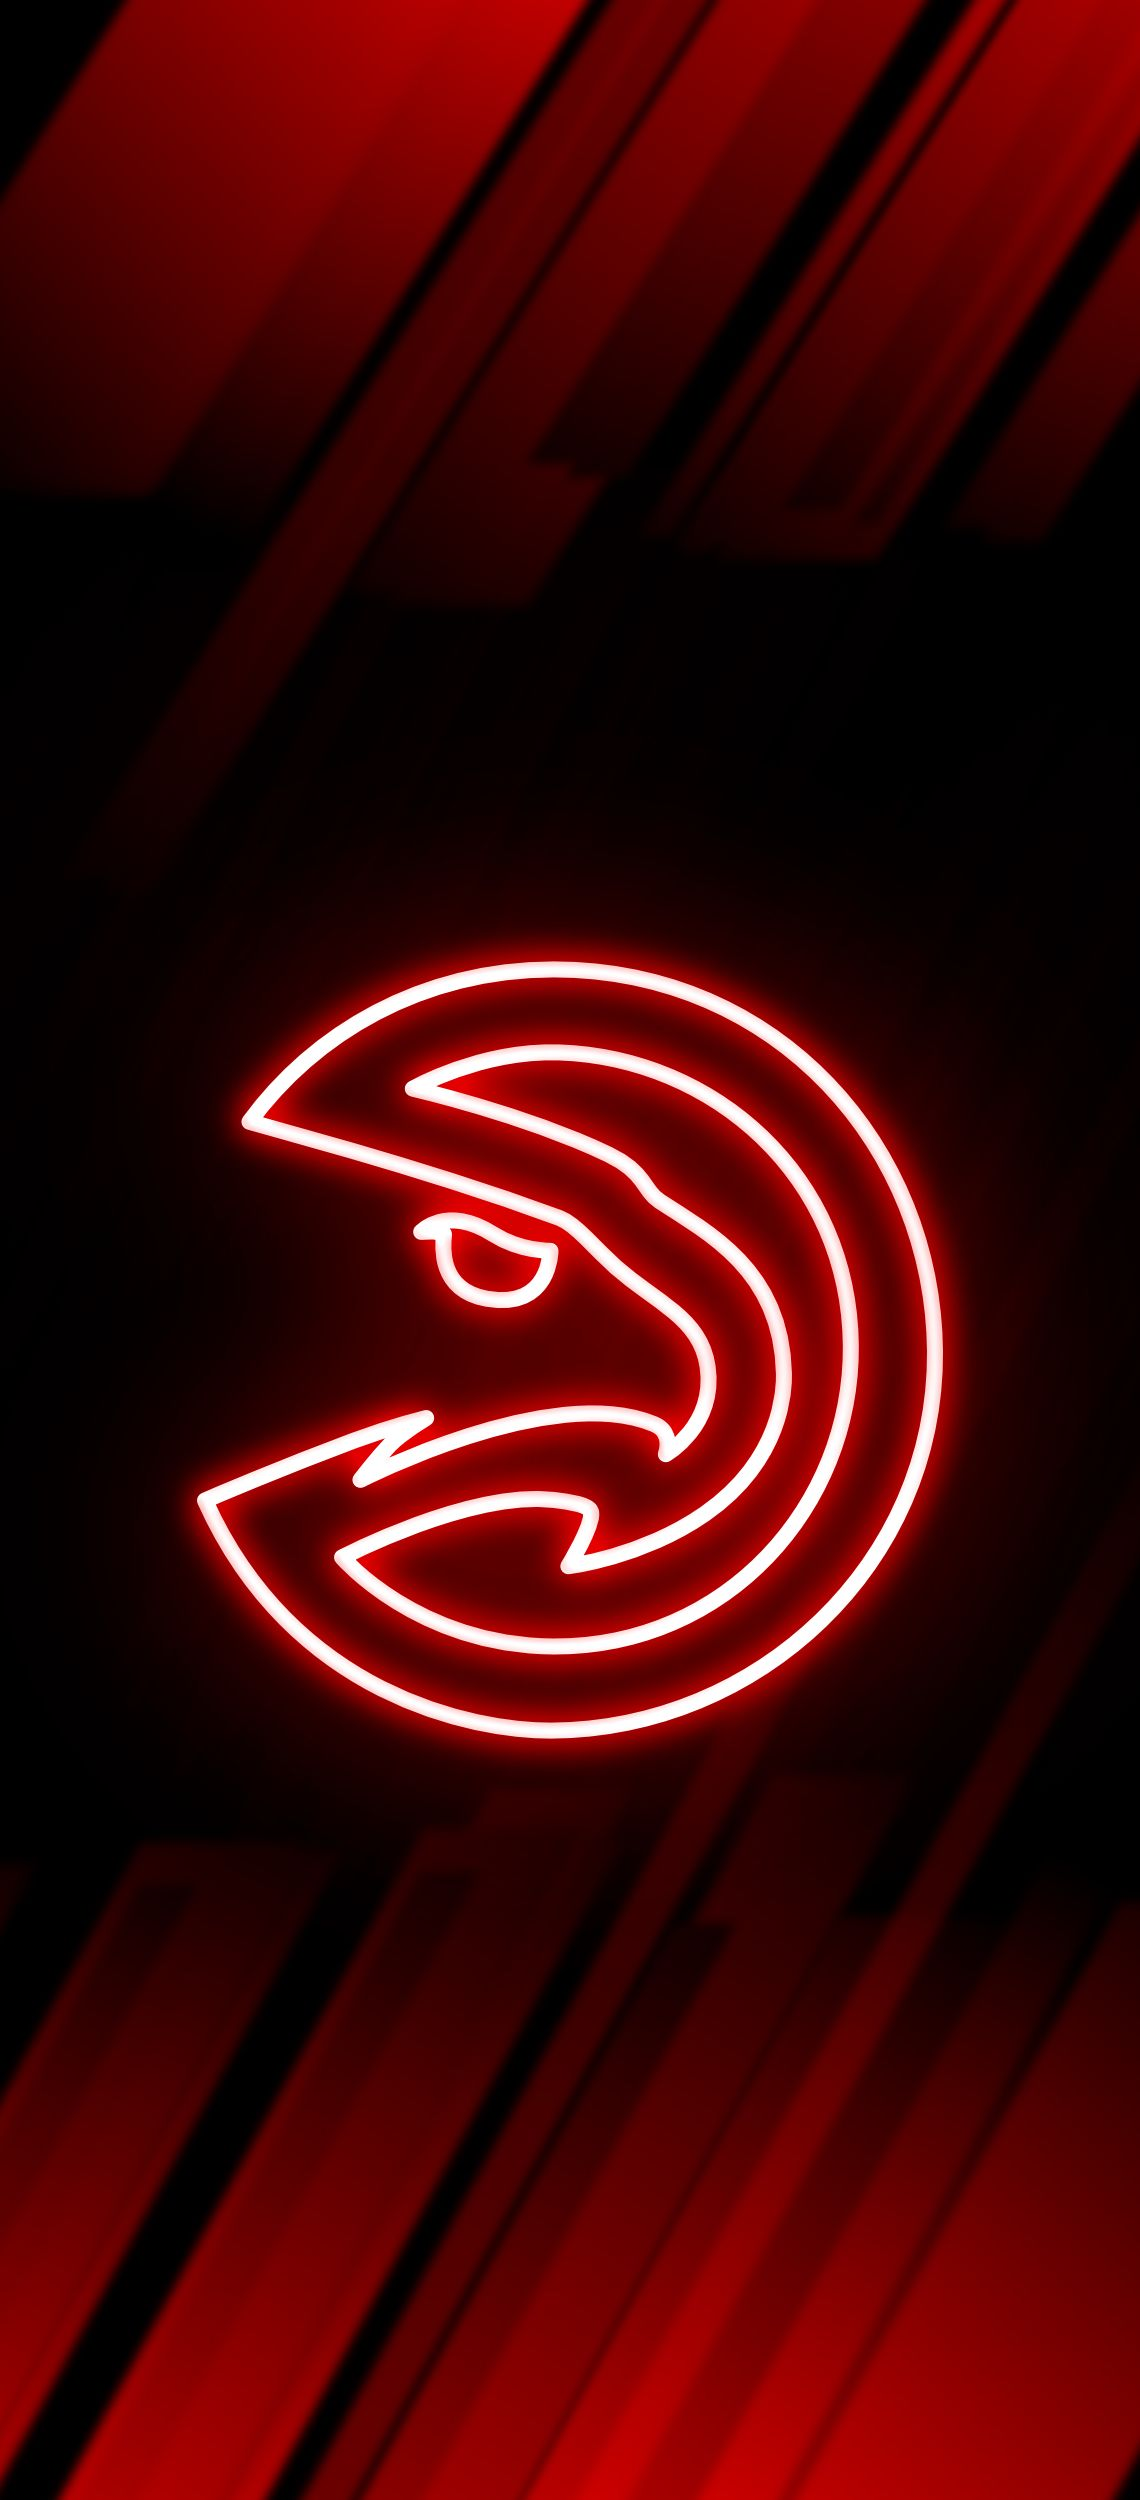 Atlanta Hawk Fluro Wallpaper Atlanta Hawks Atlanta Hawks Wallpaper Nba Basketball Teams